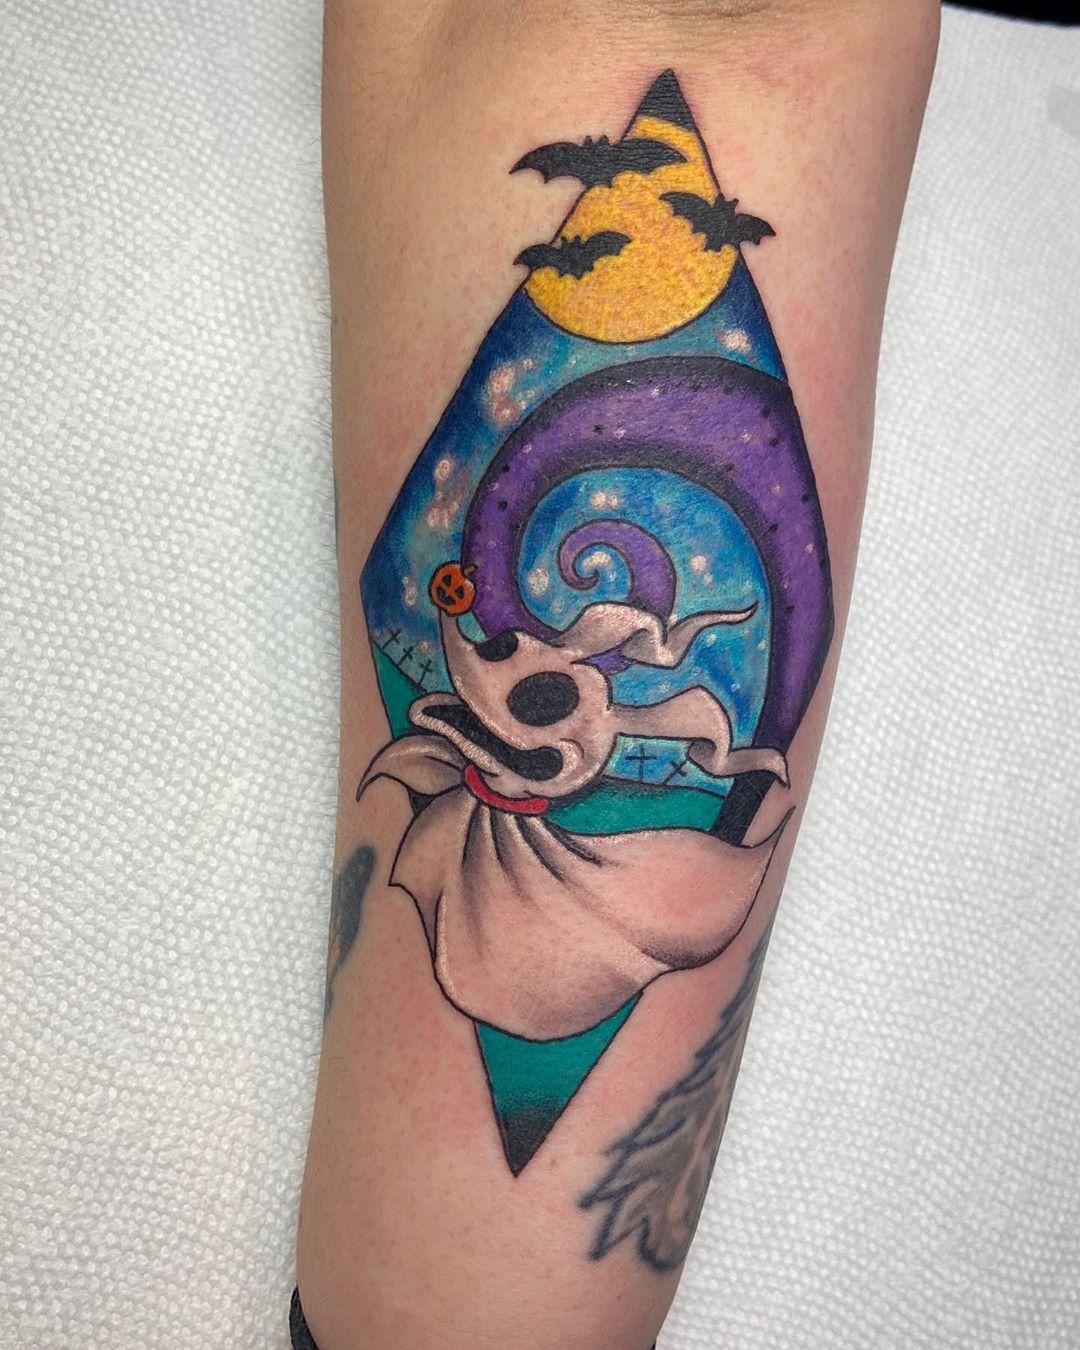 Nightmare Before Christmas Zero Tattoo : nightmare, before, christmas, tattoo, UPDATED:, Nightmare, Before, Christmas, Tattoos, (November, 2020)